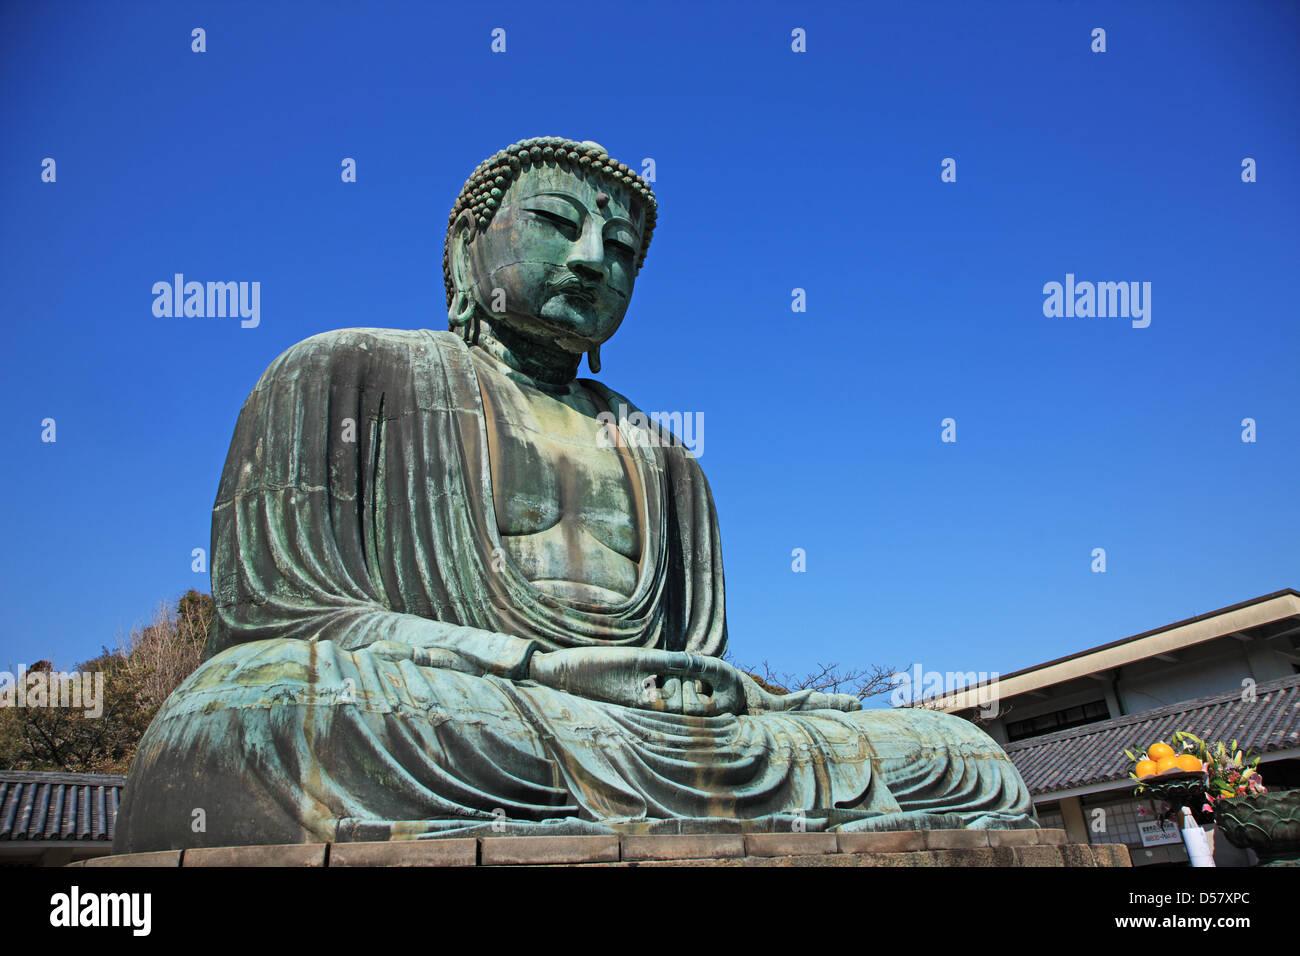 Japan, Kanagawa Prefecture, the Great Buddha of Kamakura - Stock Image